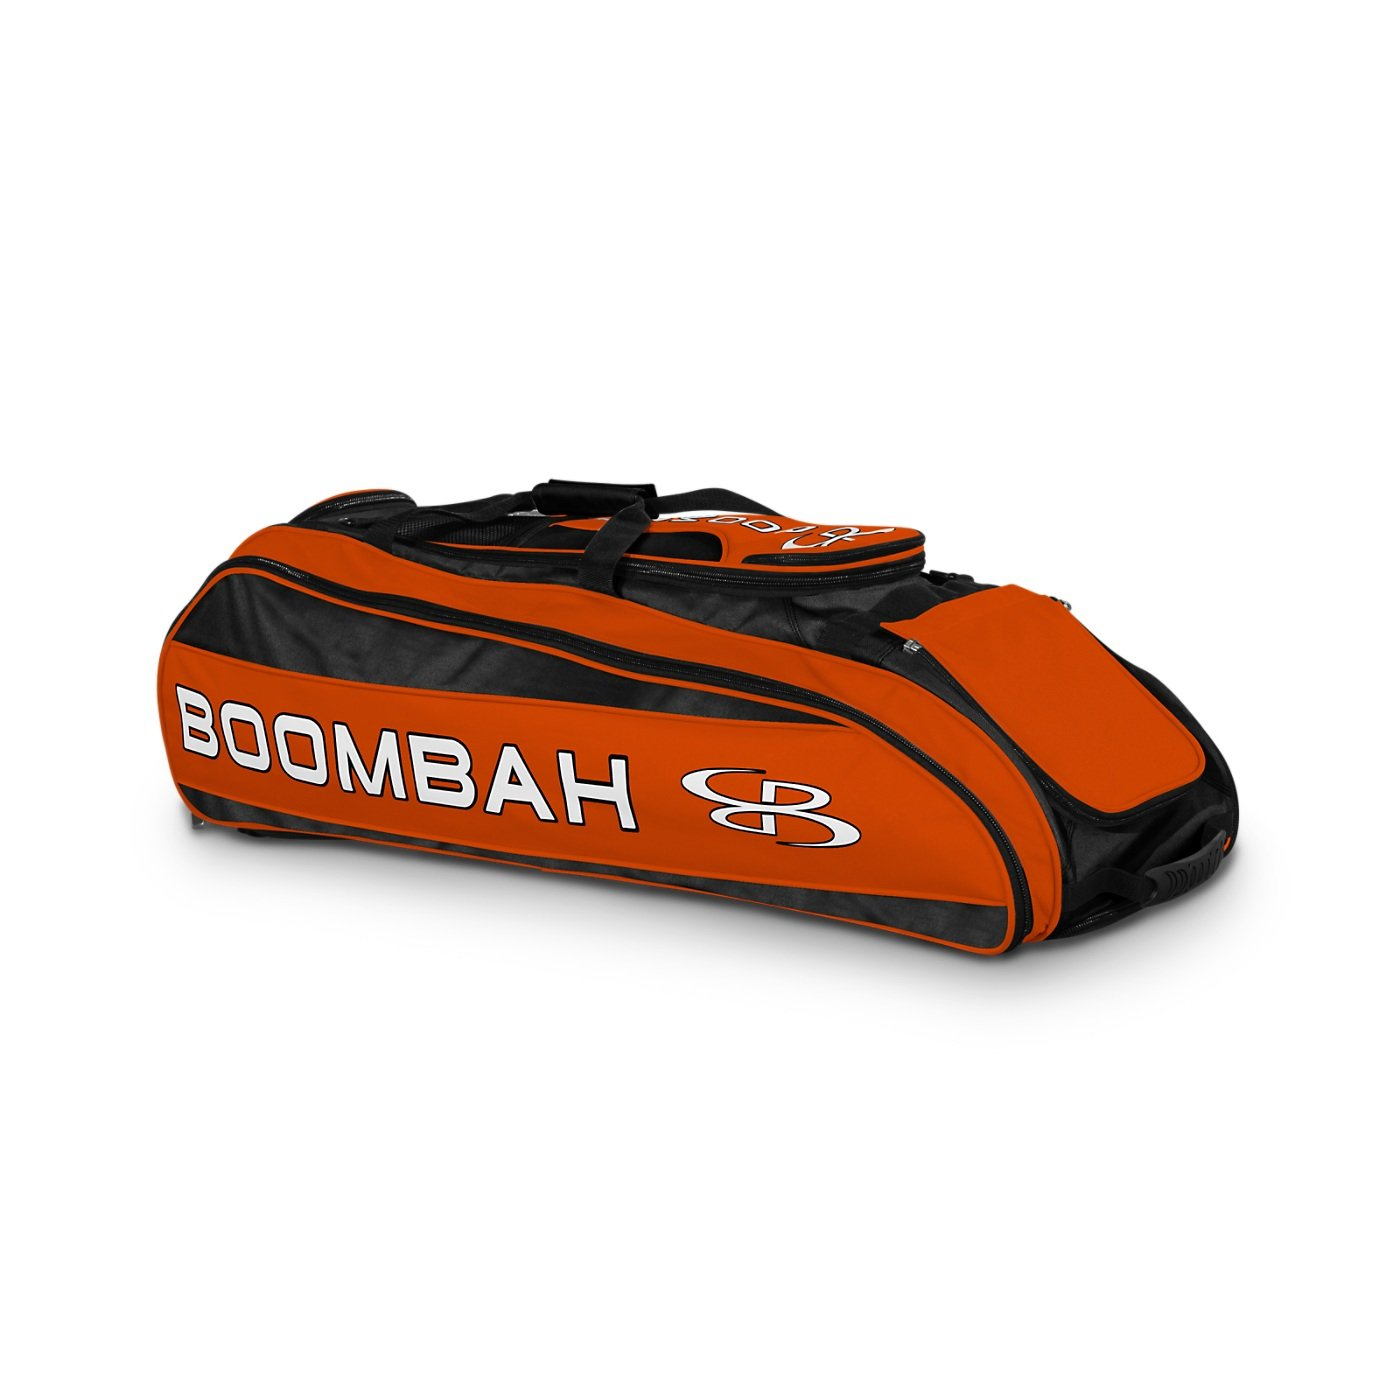 Boombah Beast Baseball / Softball Bat Bag - 40'' x 14'' x 13'' - Black/Orange - Holds 8 Bats, Glove & Shoe Compartments by Boombah (Image #1)